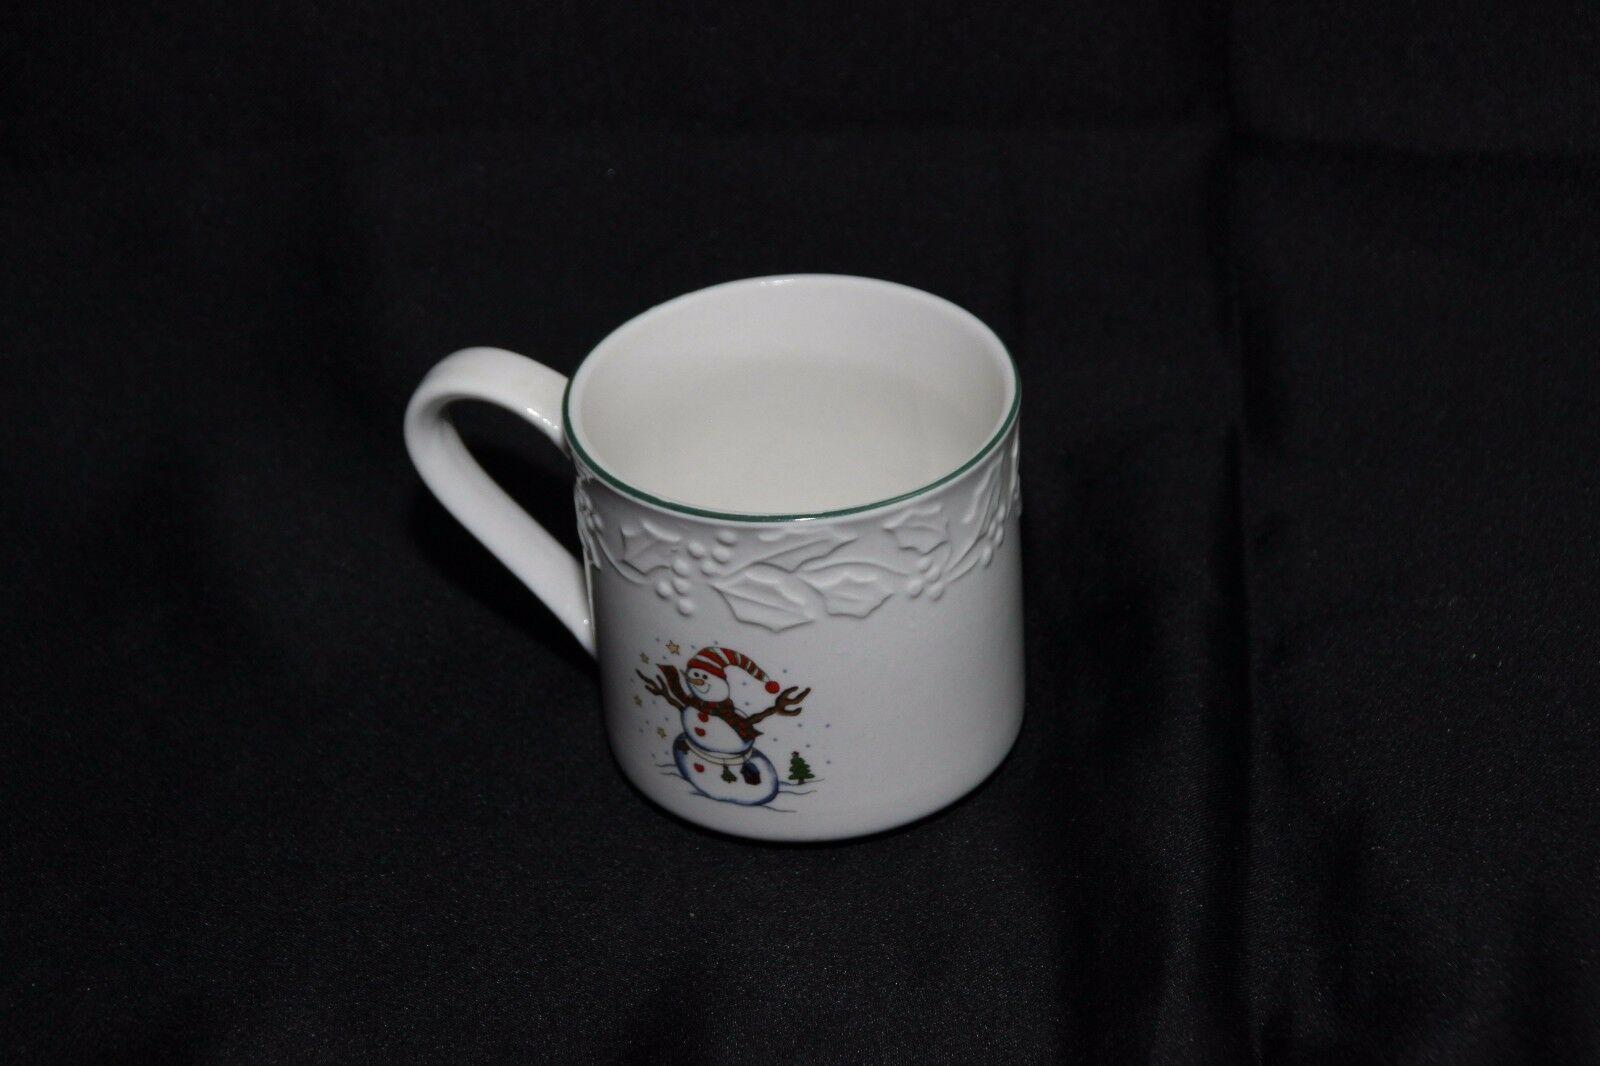 GEI Snowman Xmas 4 Cups 2 Saucers image 4